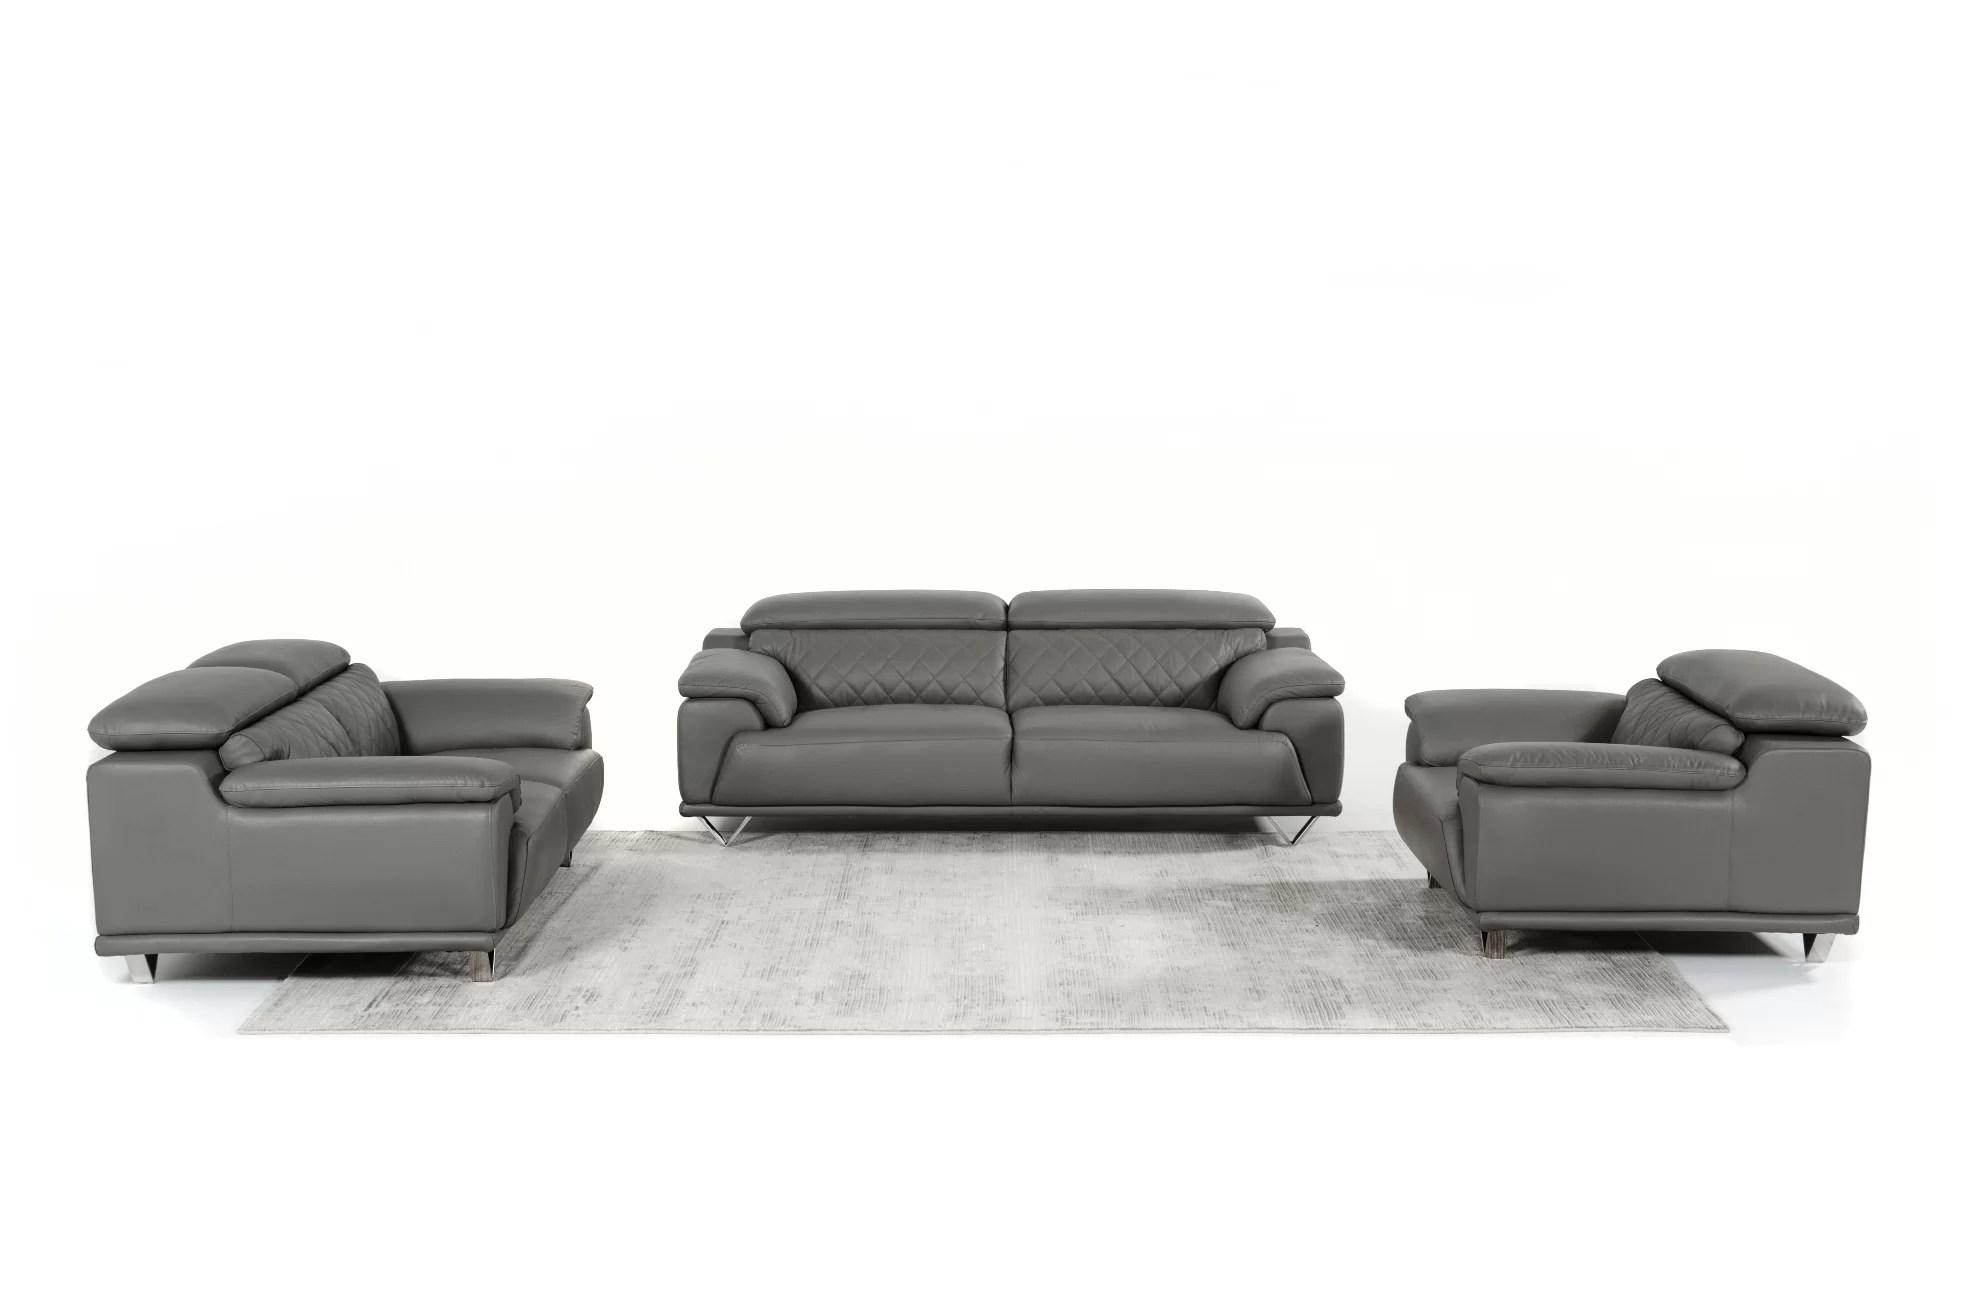 3 piece black leather living room set ideas for small modern orren ellis cardinale wayfair